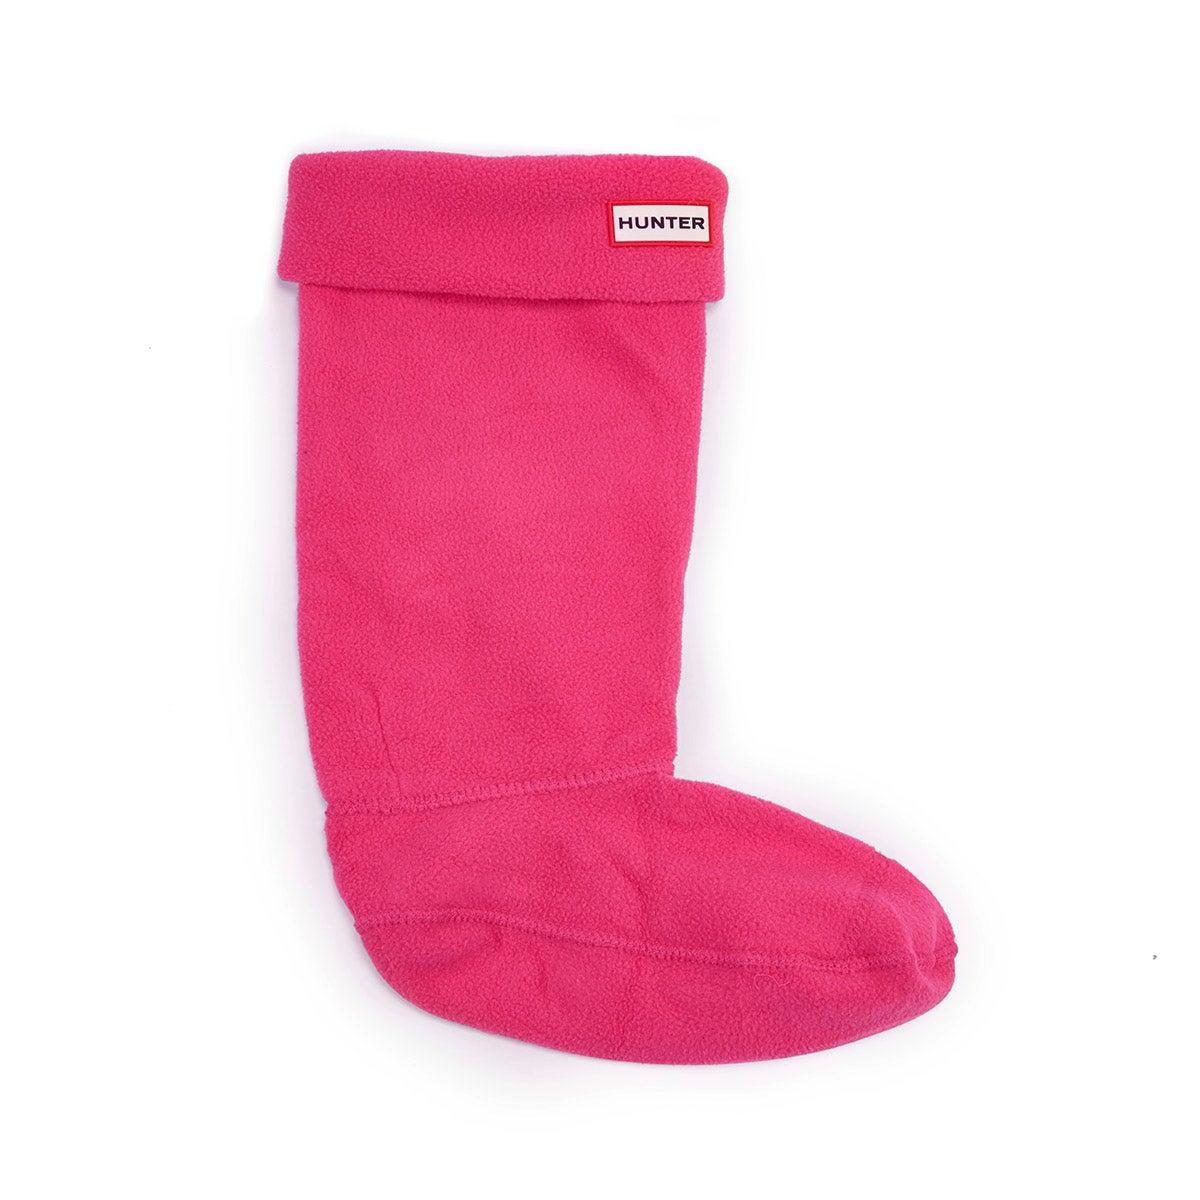 Kds fuchsia boot sock